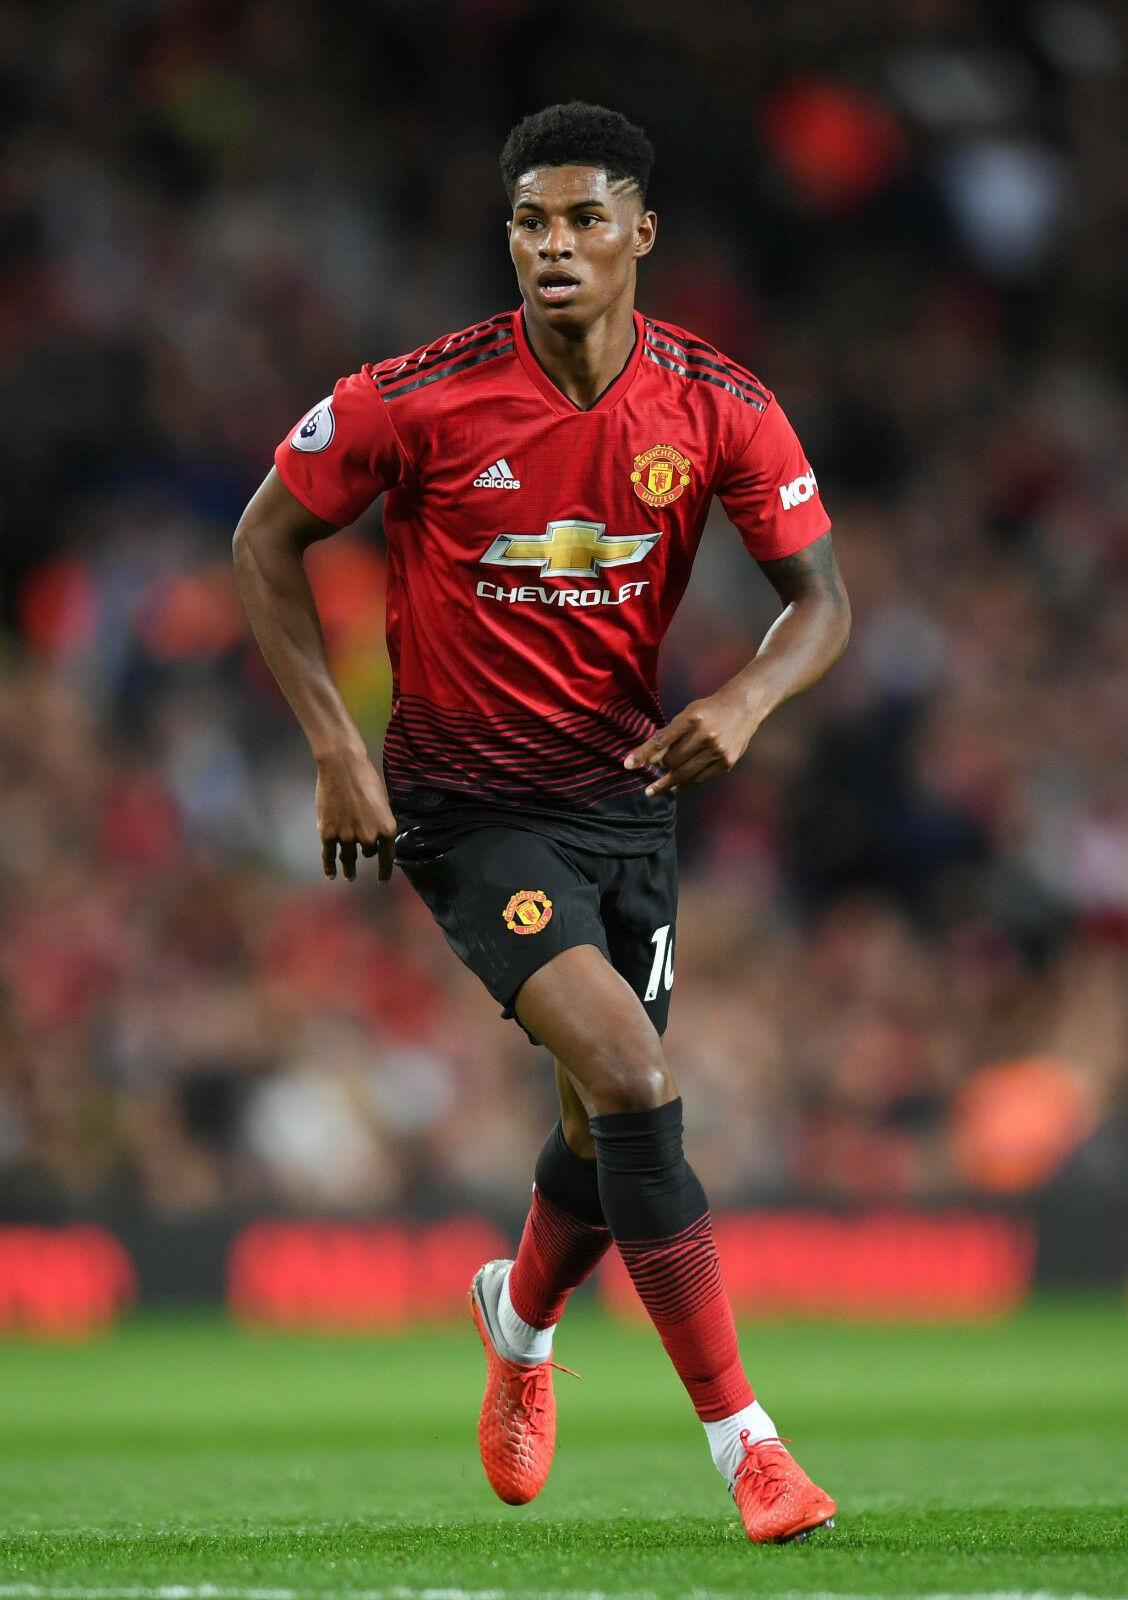 Marcus Rashford of Man Utd in 2018. | Manchester united